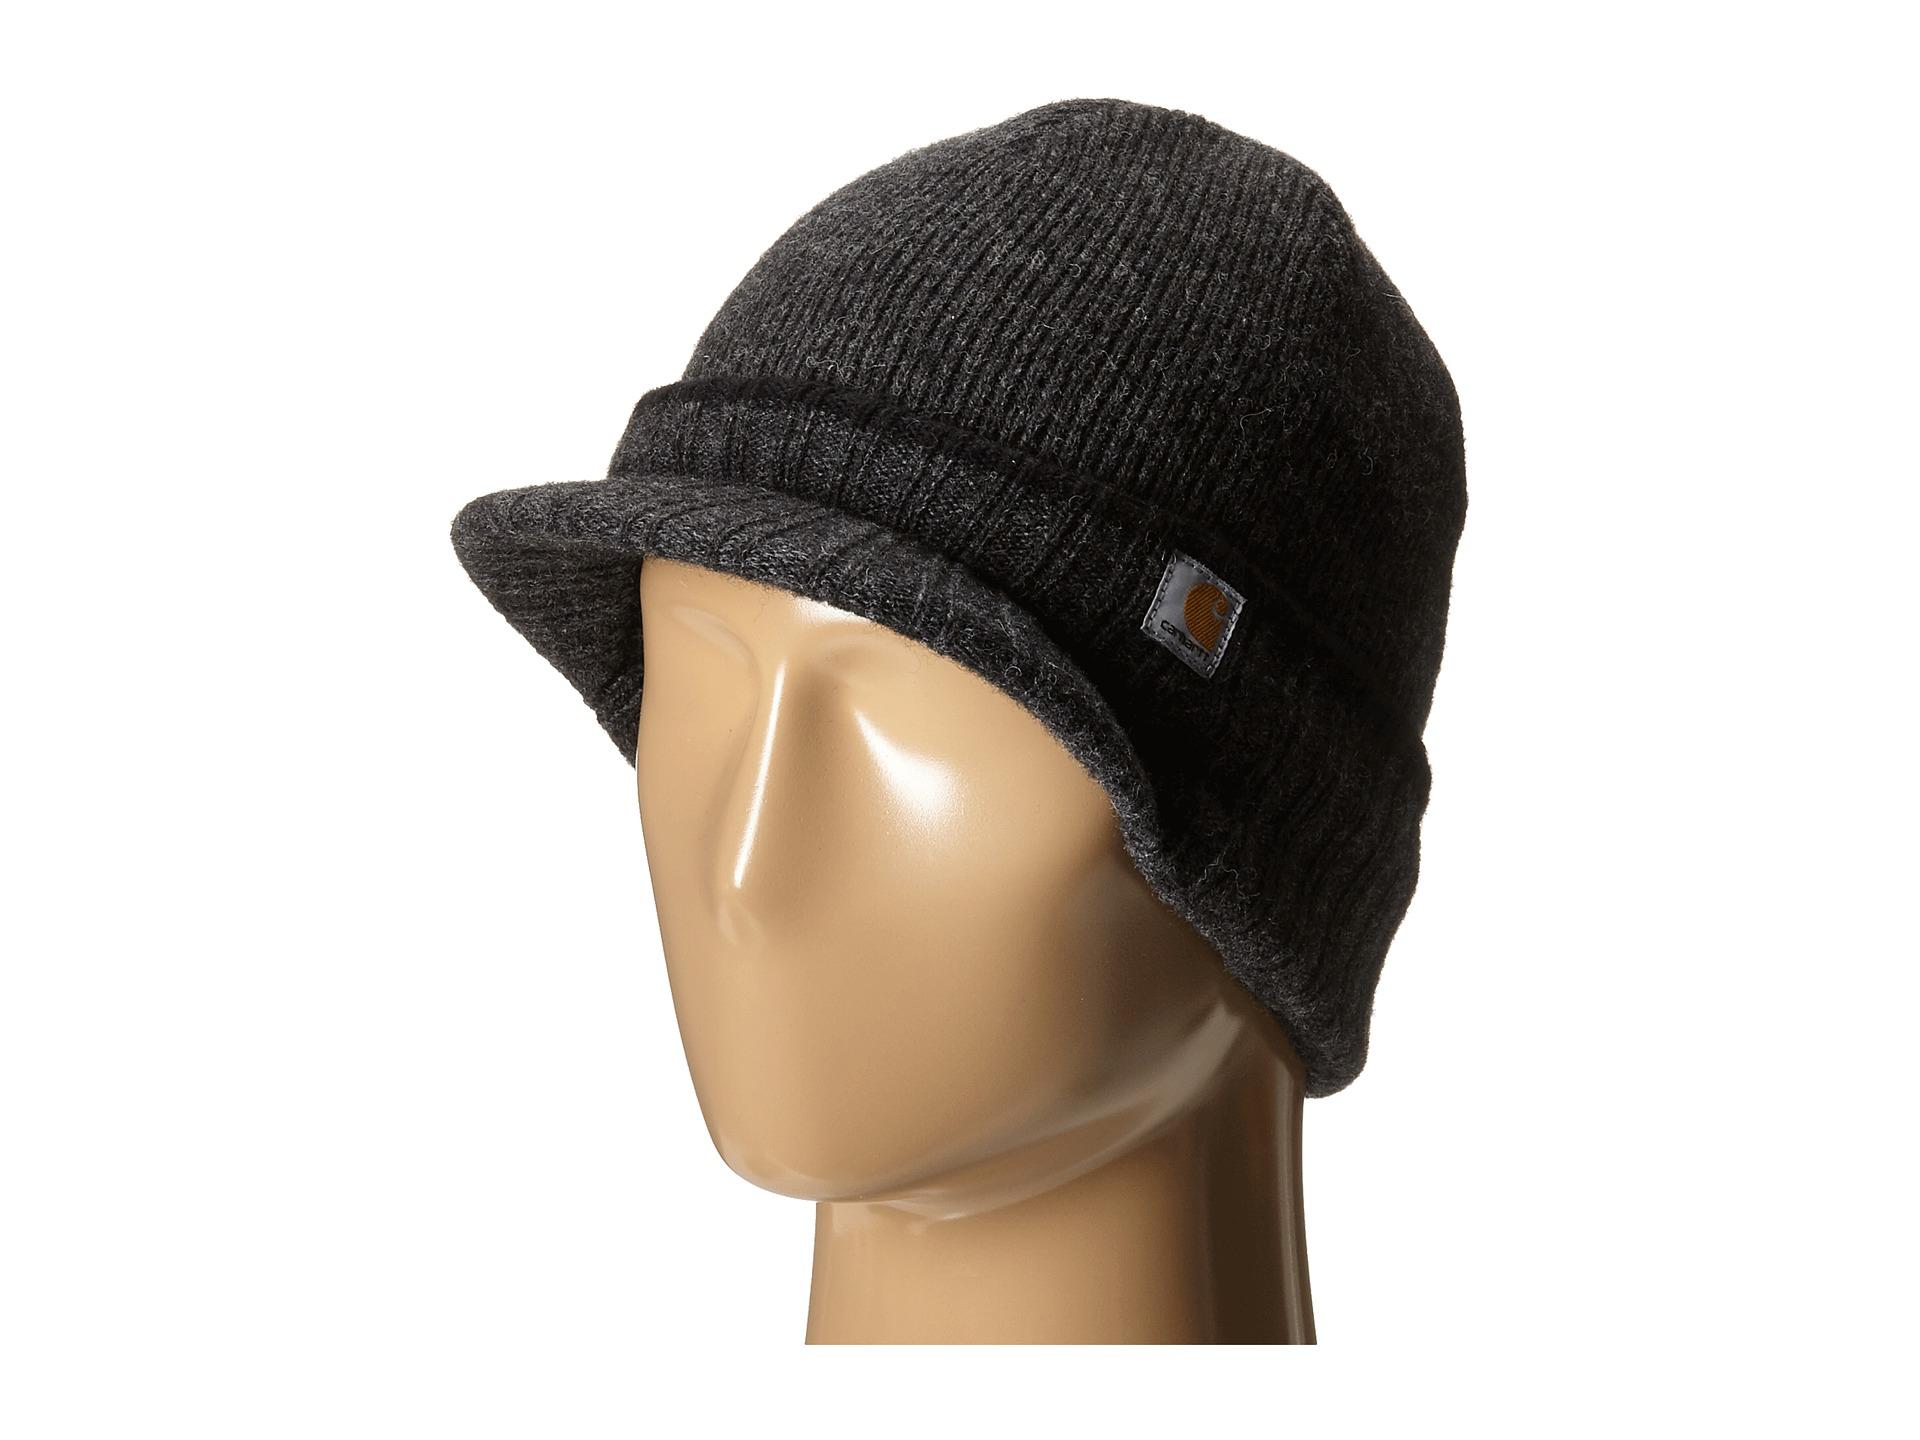 2facea8baba ... canada lyst carhartt marshfield hat in gray for men 764d8 5c78a